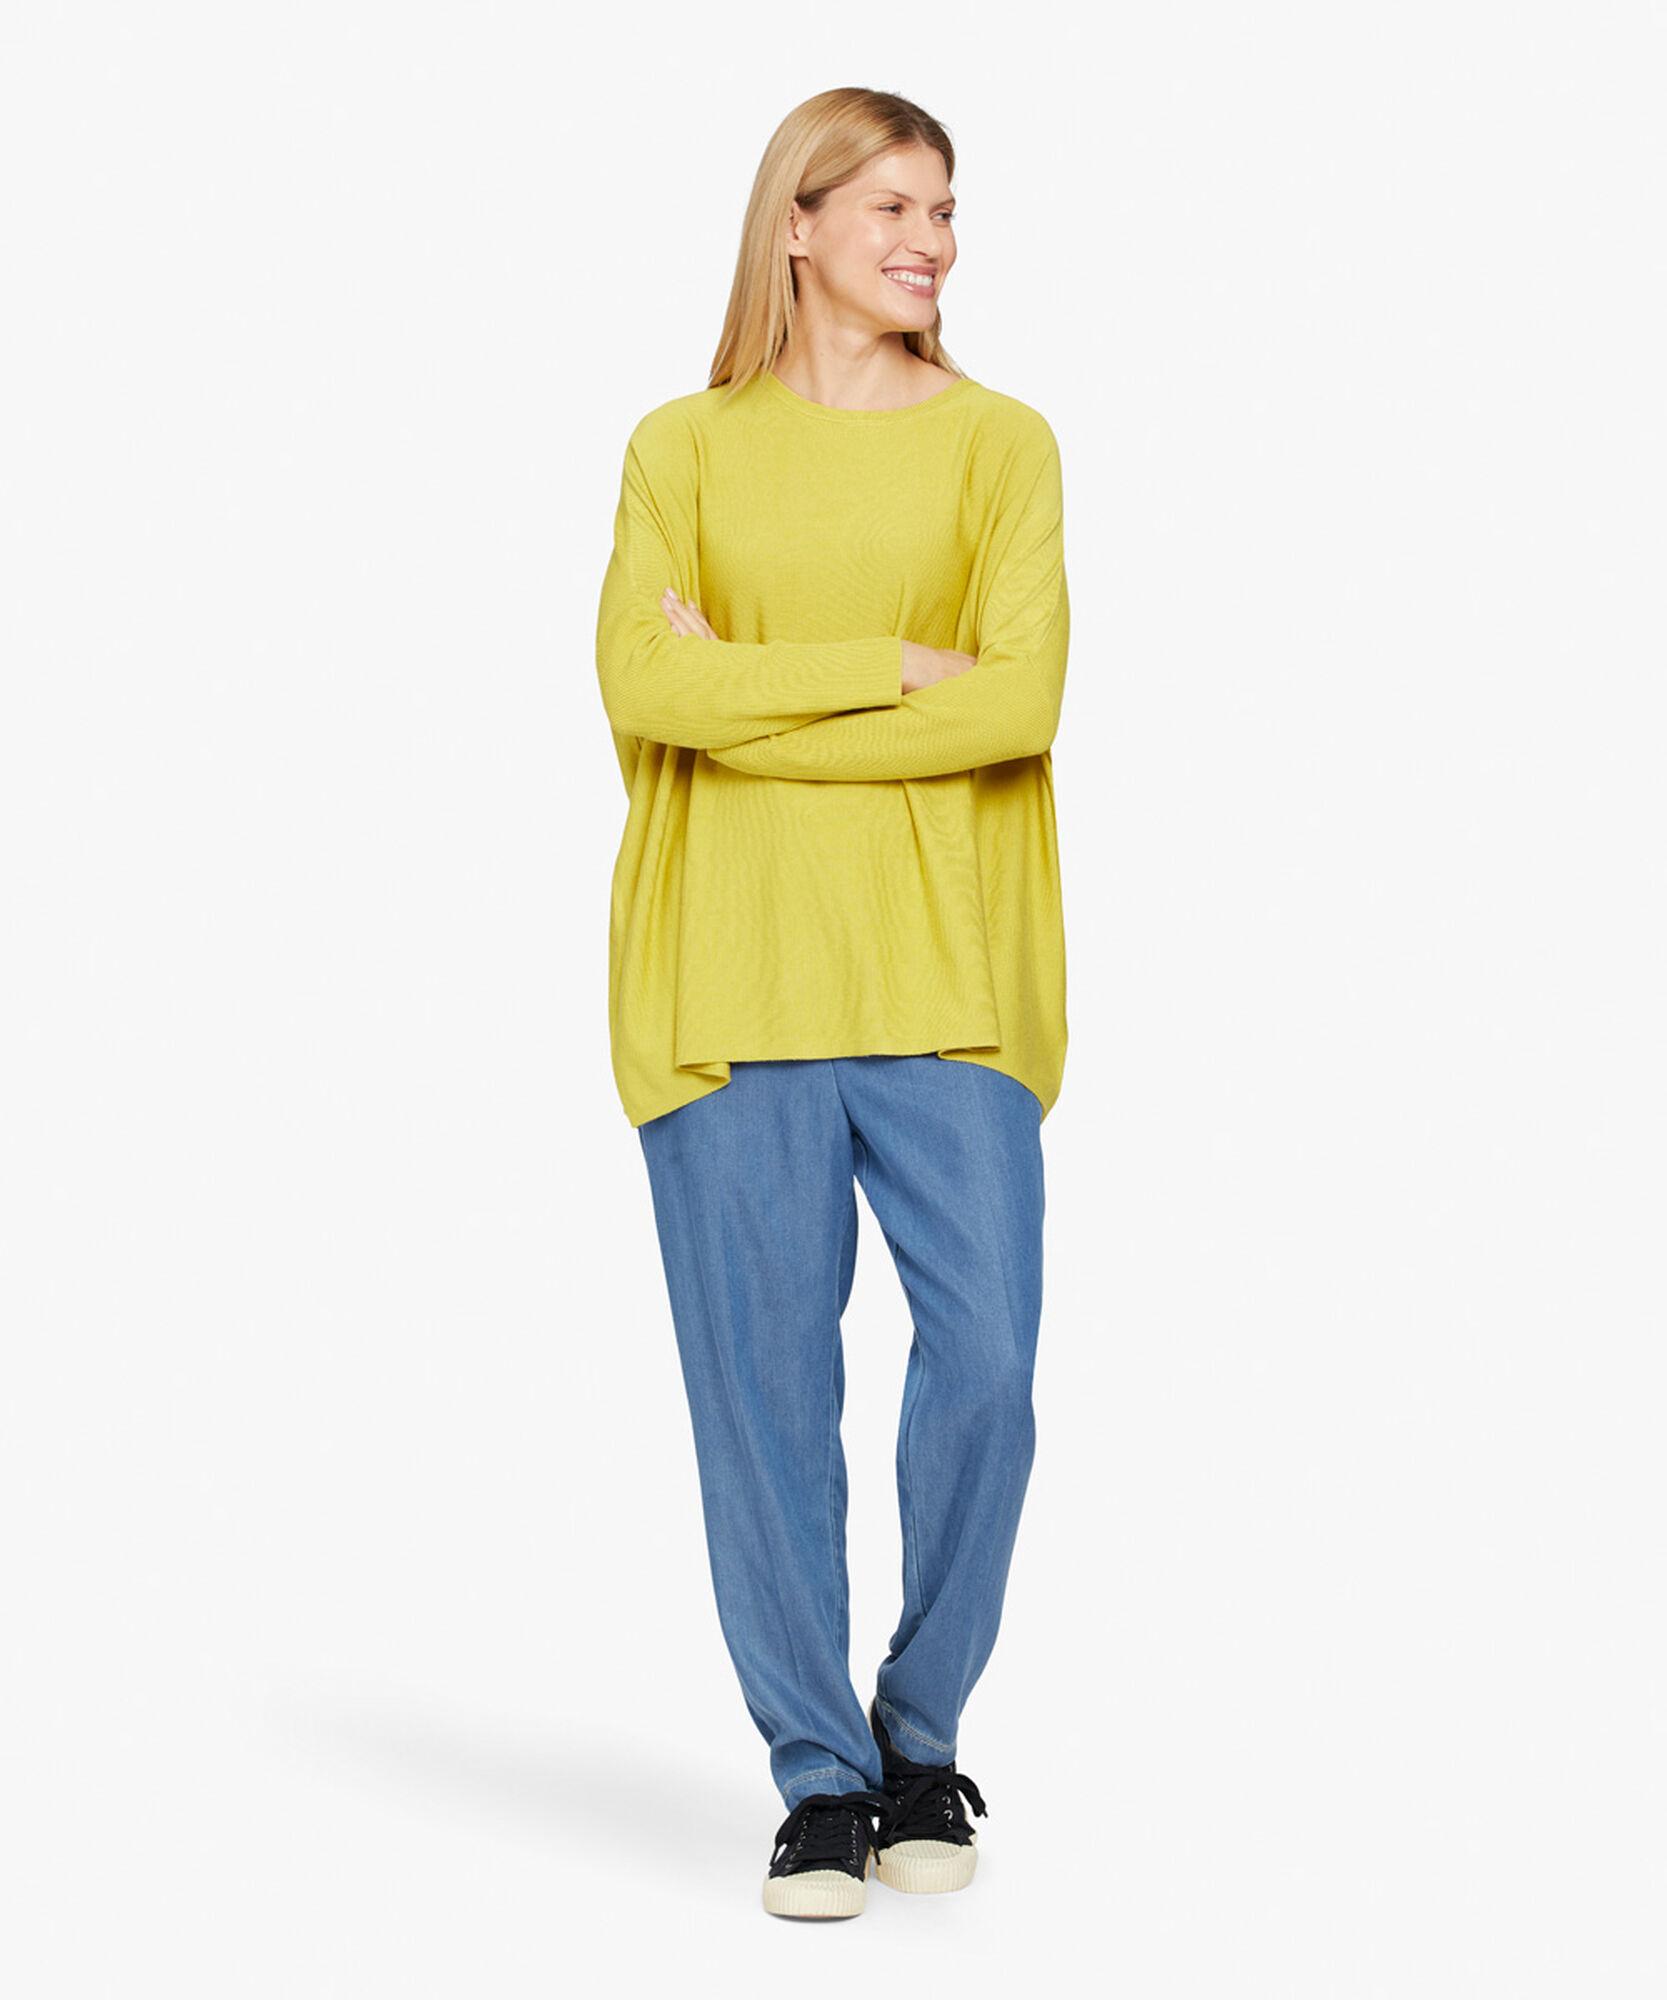 FANASI SHIRT, Oil Yellow, hi-res